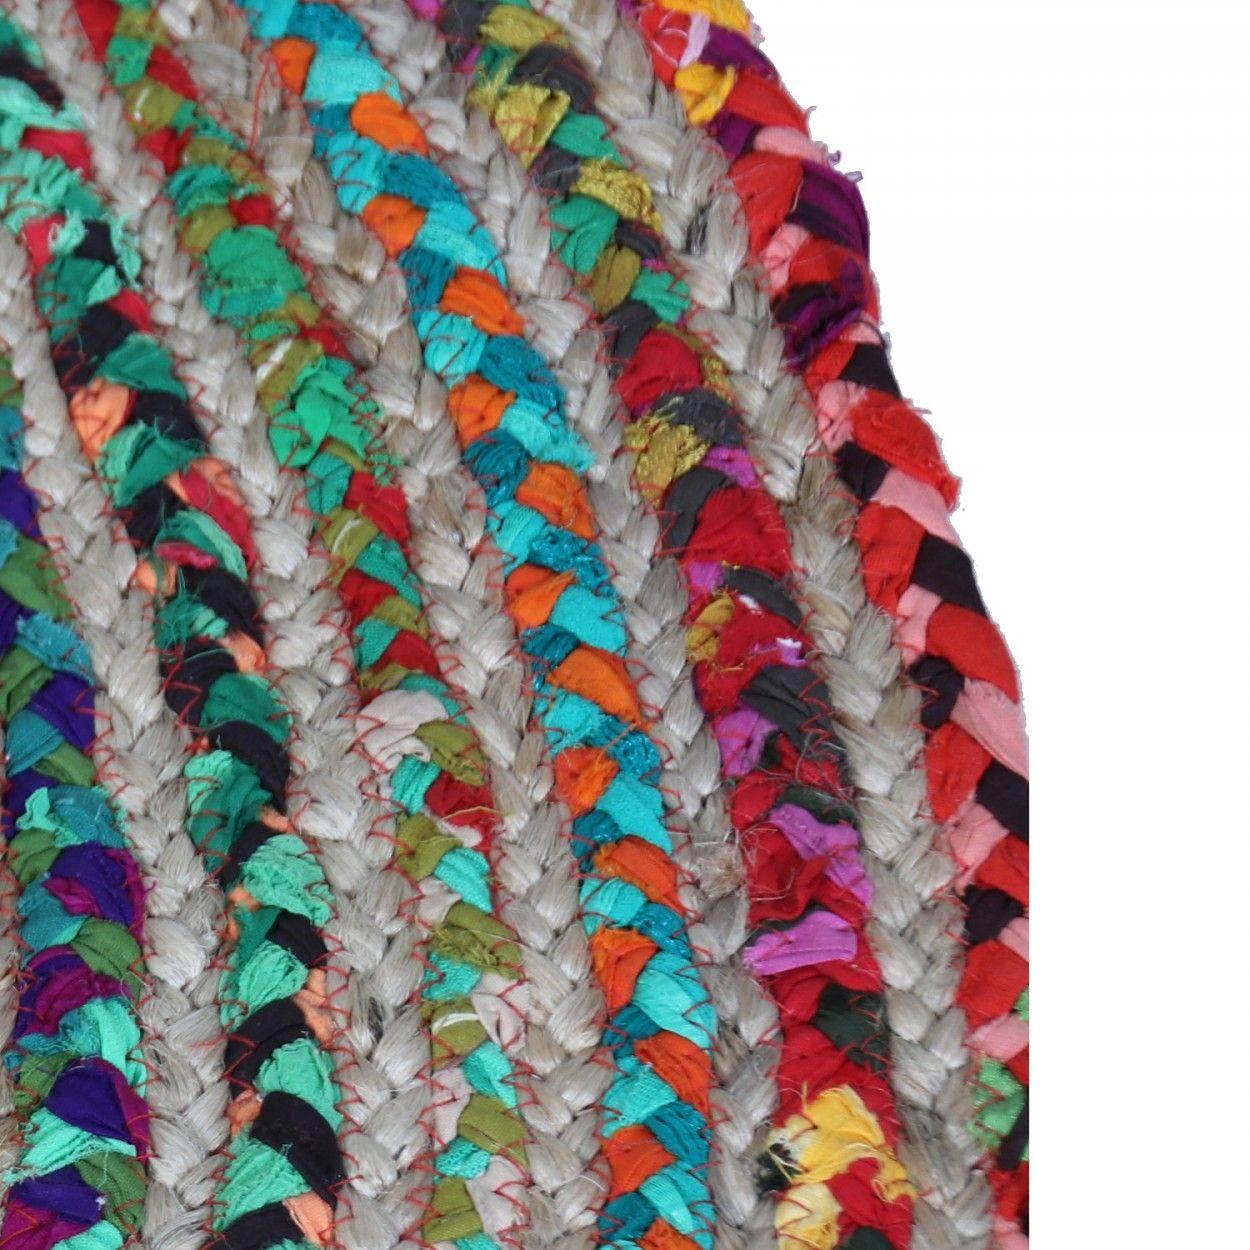 Compra alfombra de mimbre colorida con dise o tnico Mas alfombrar